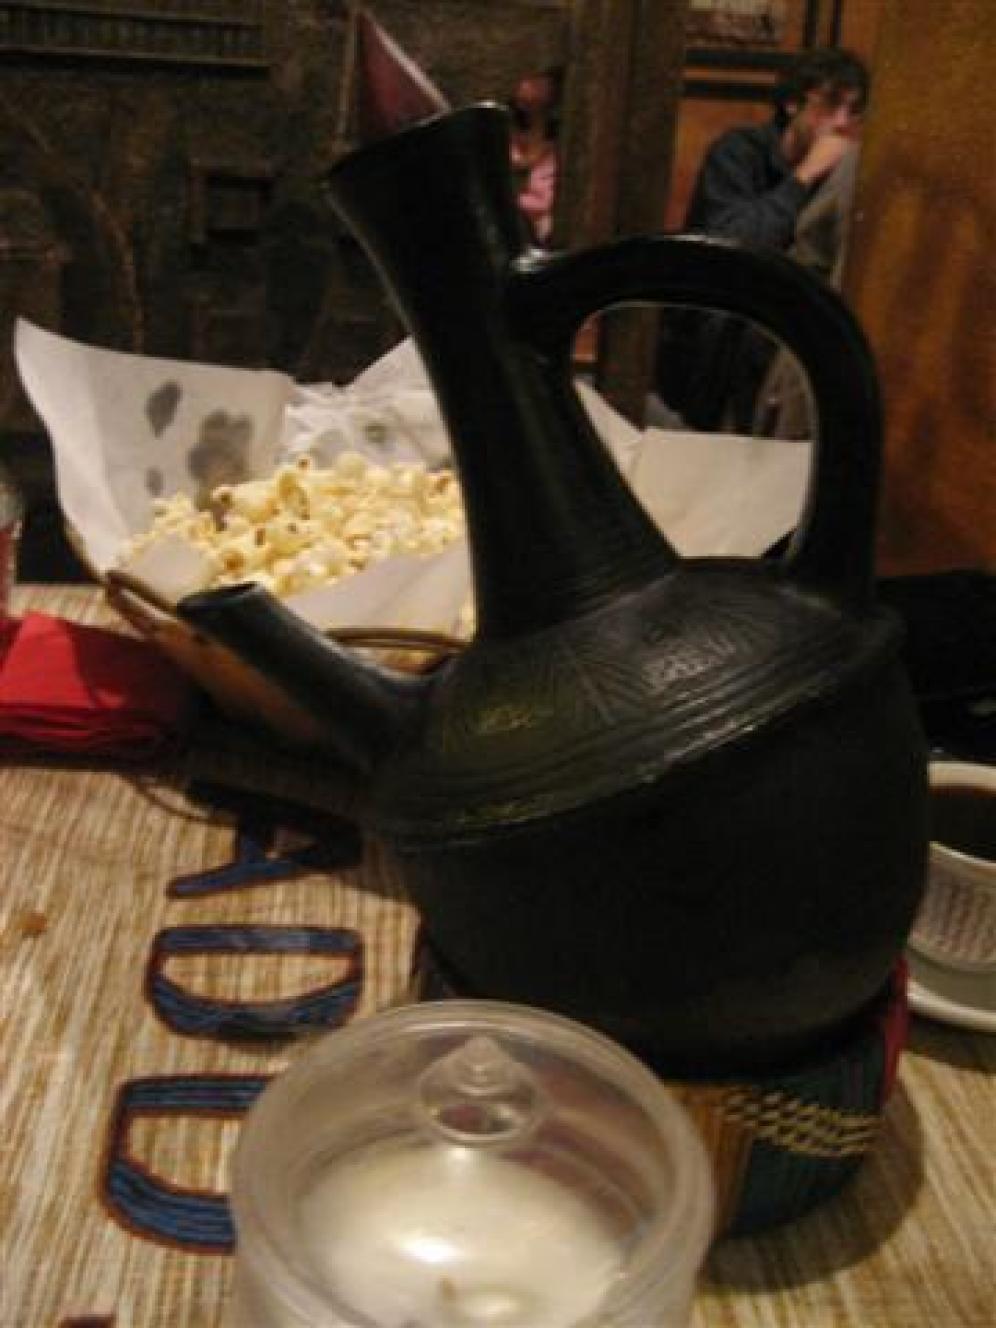 Addis Coffee and Popcorn